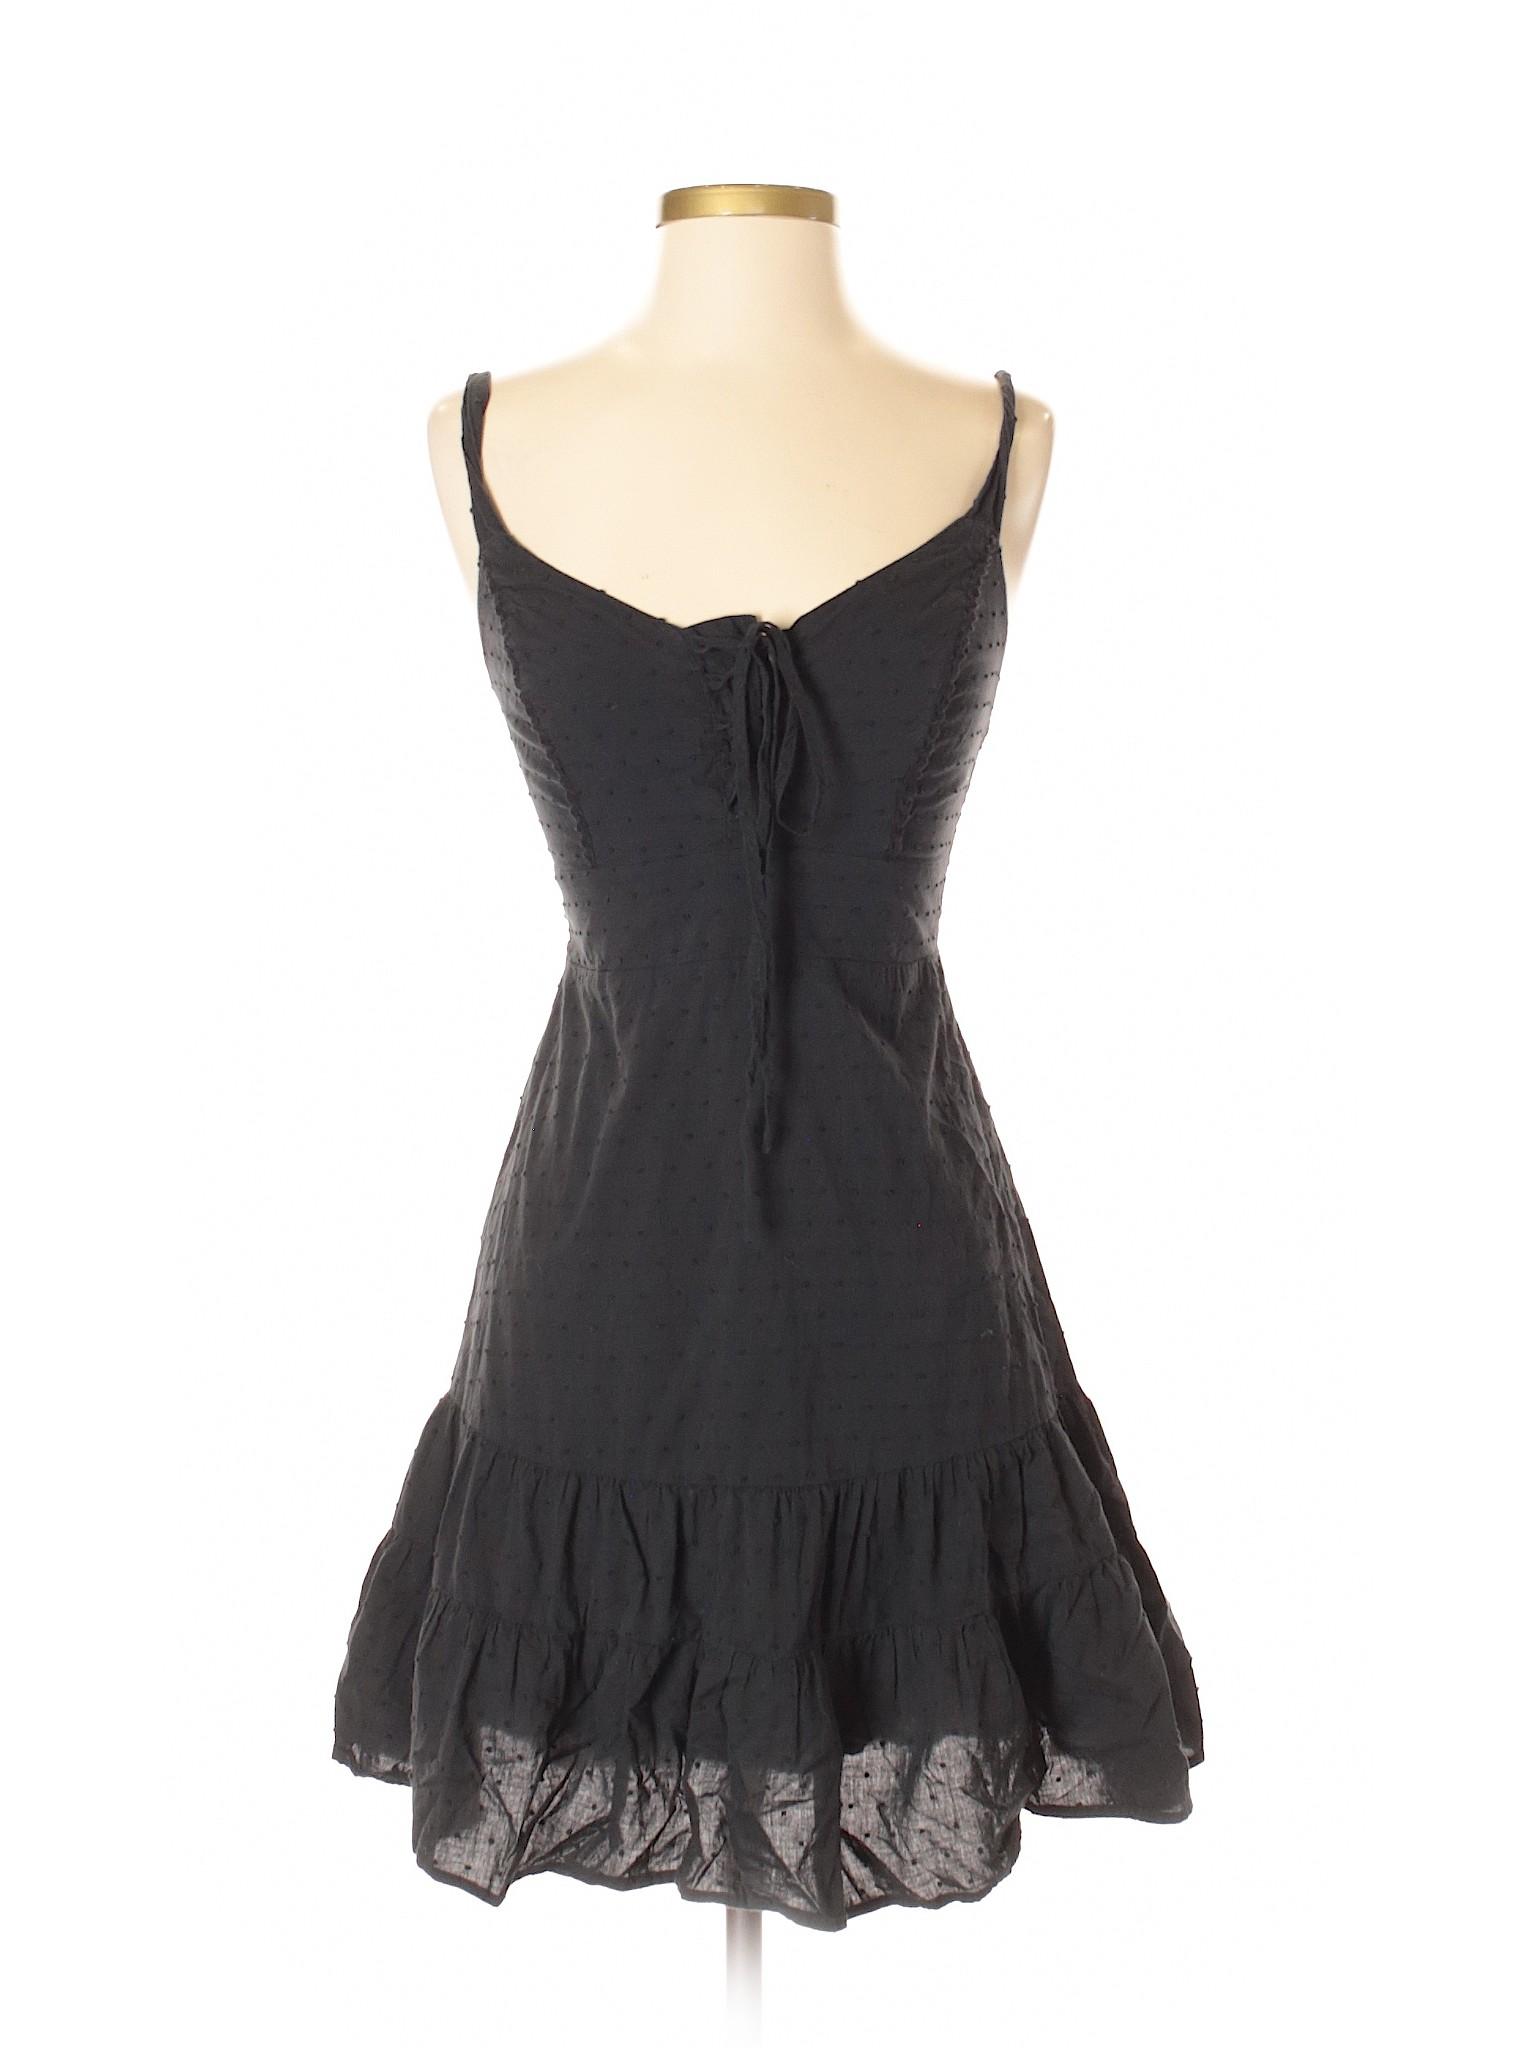 Casual Selling Selling Xhilaration Dress Xhilaration n716R7p